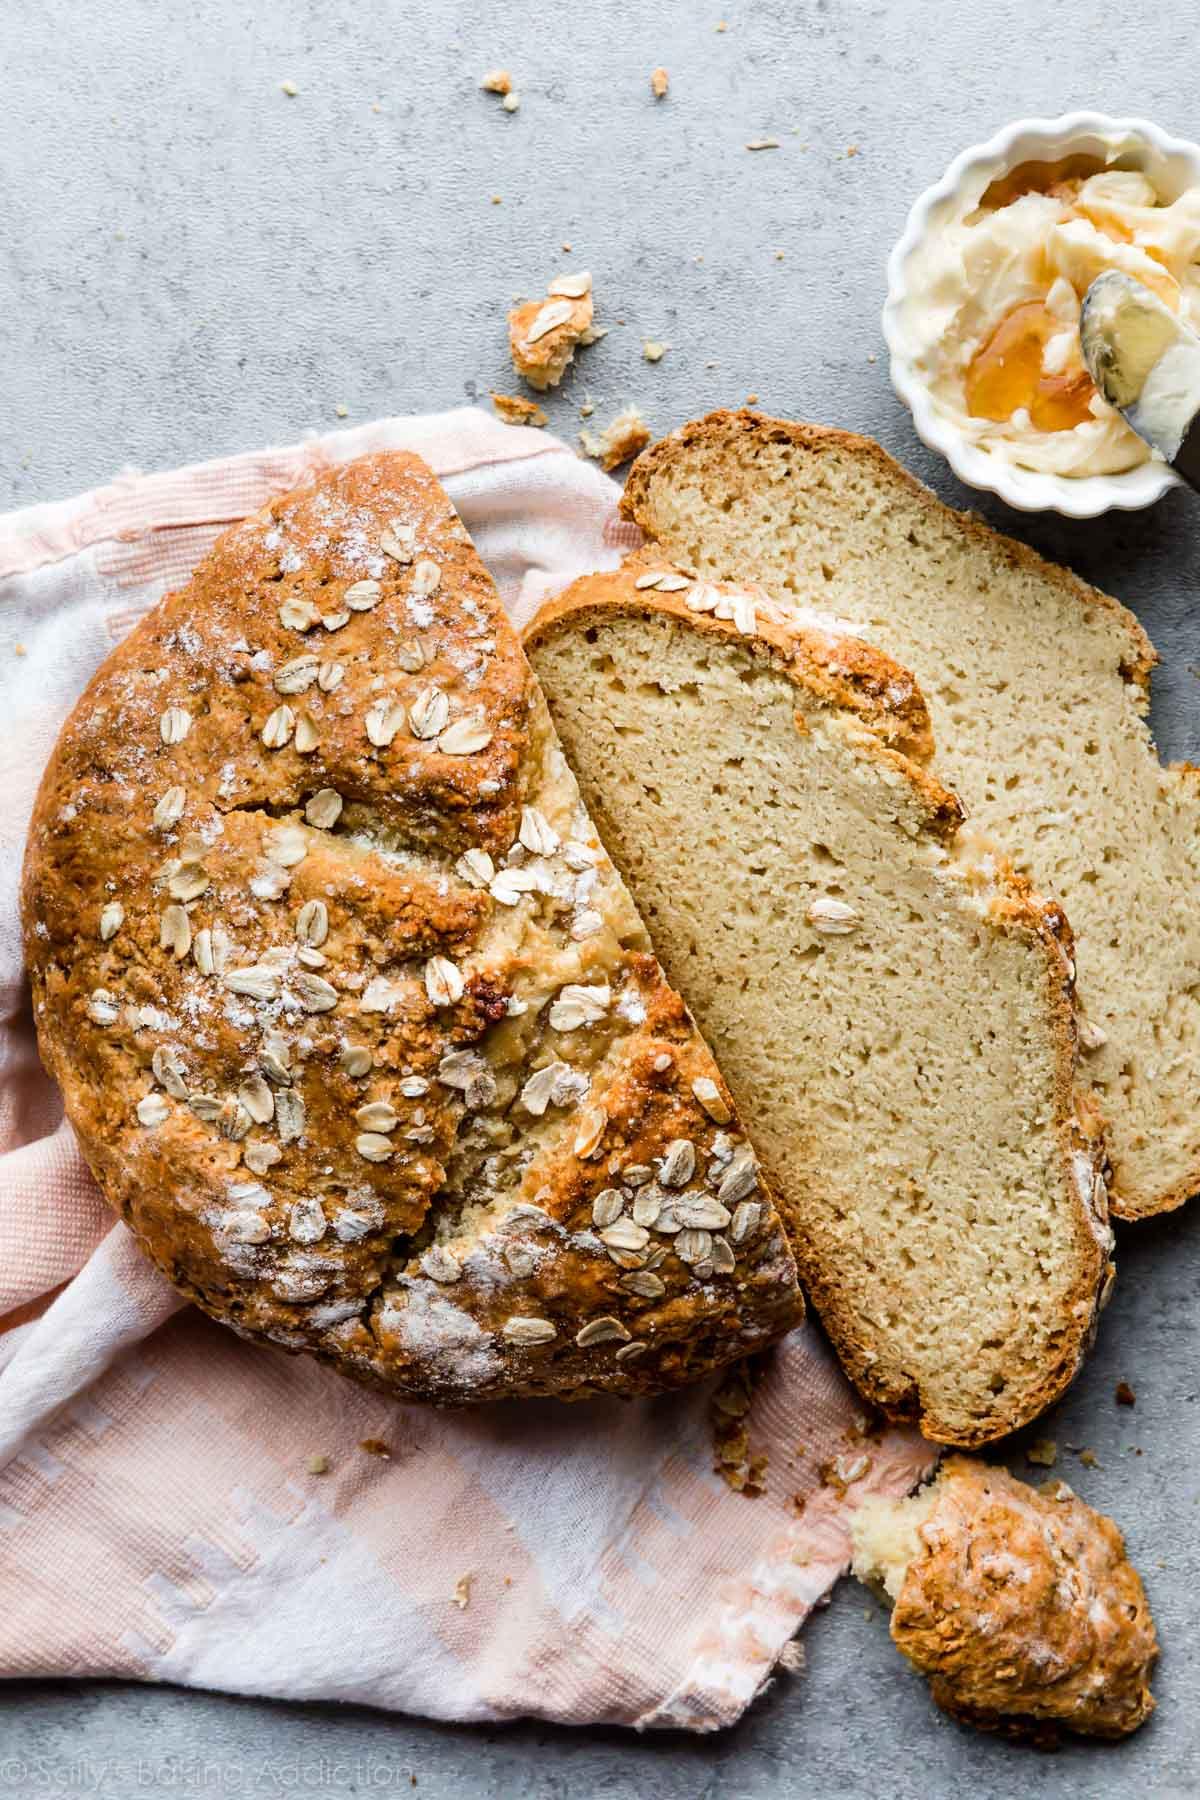 Homemade No Yeast Bread (Soda Bread)